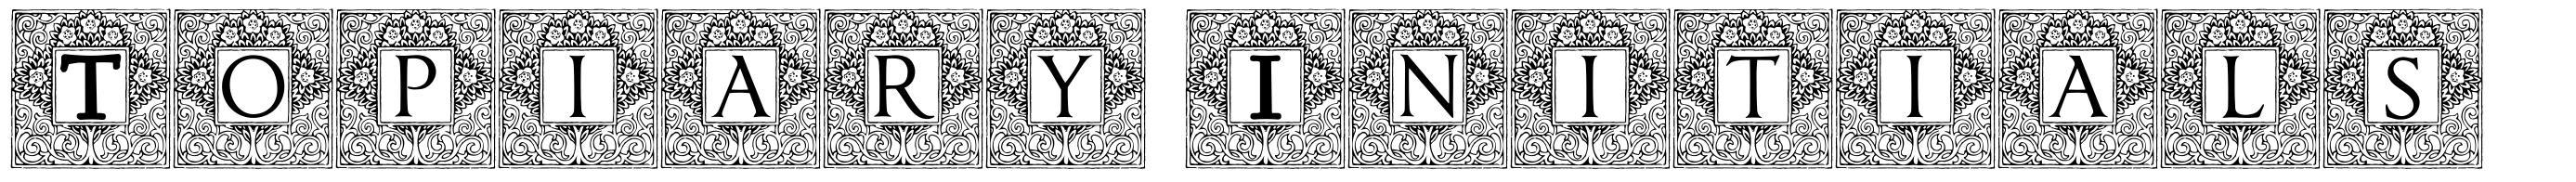 Topiary Initials